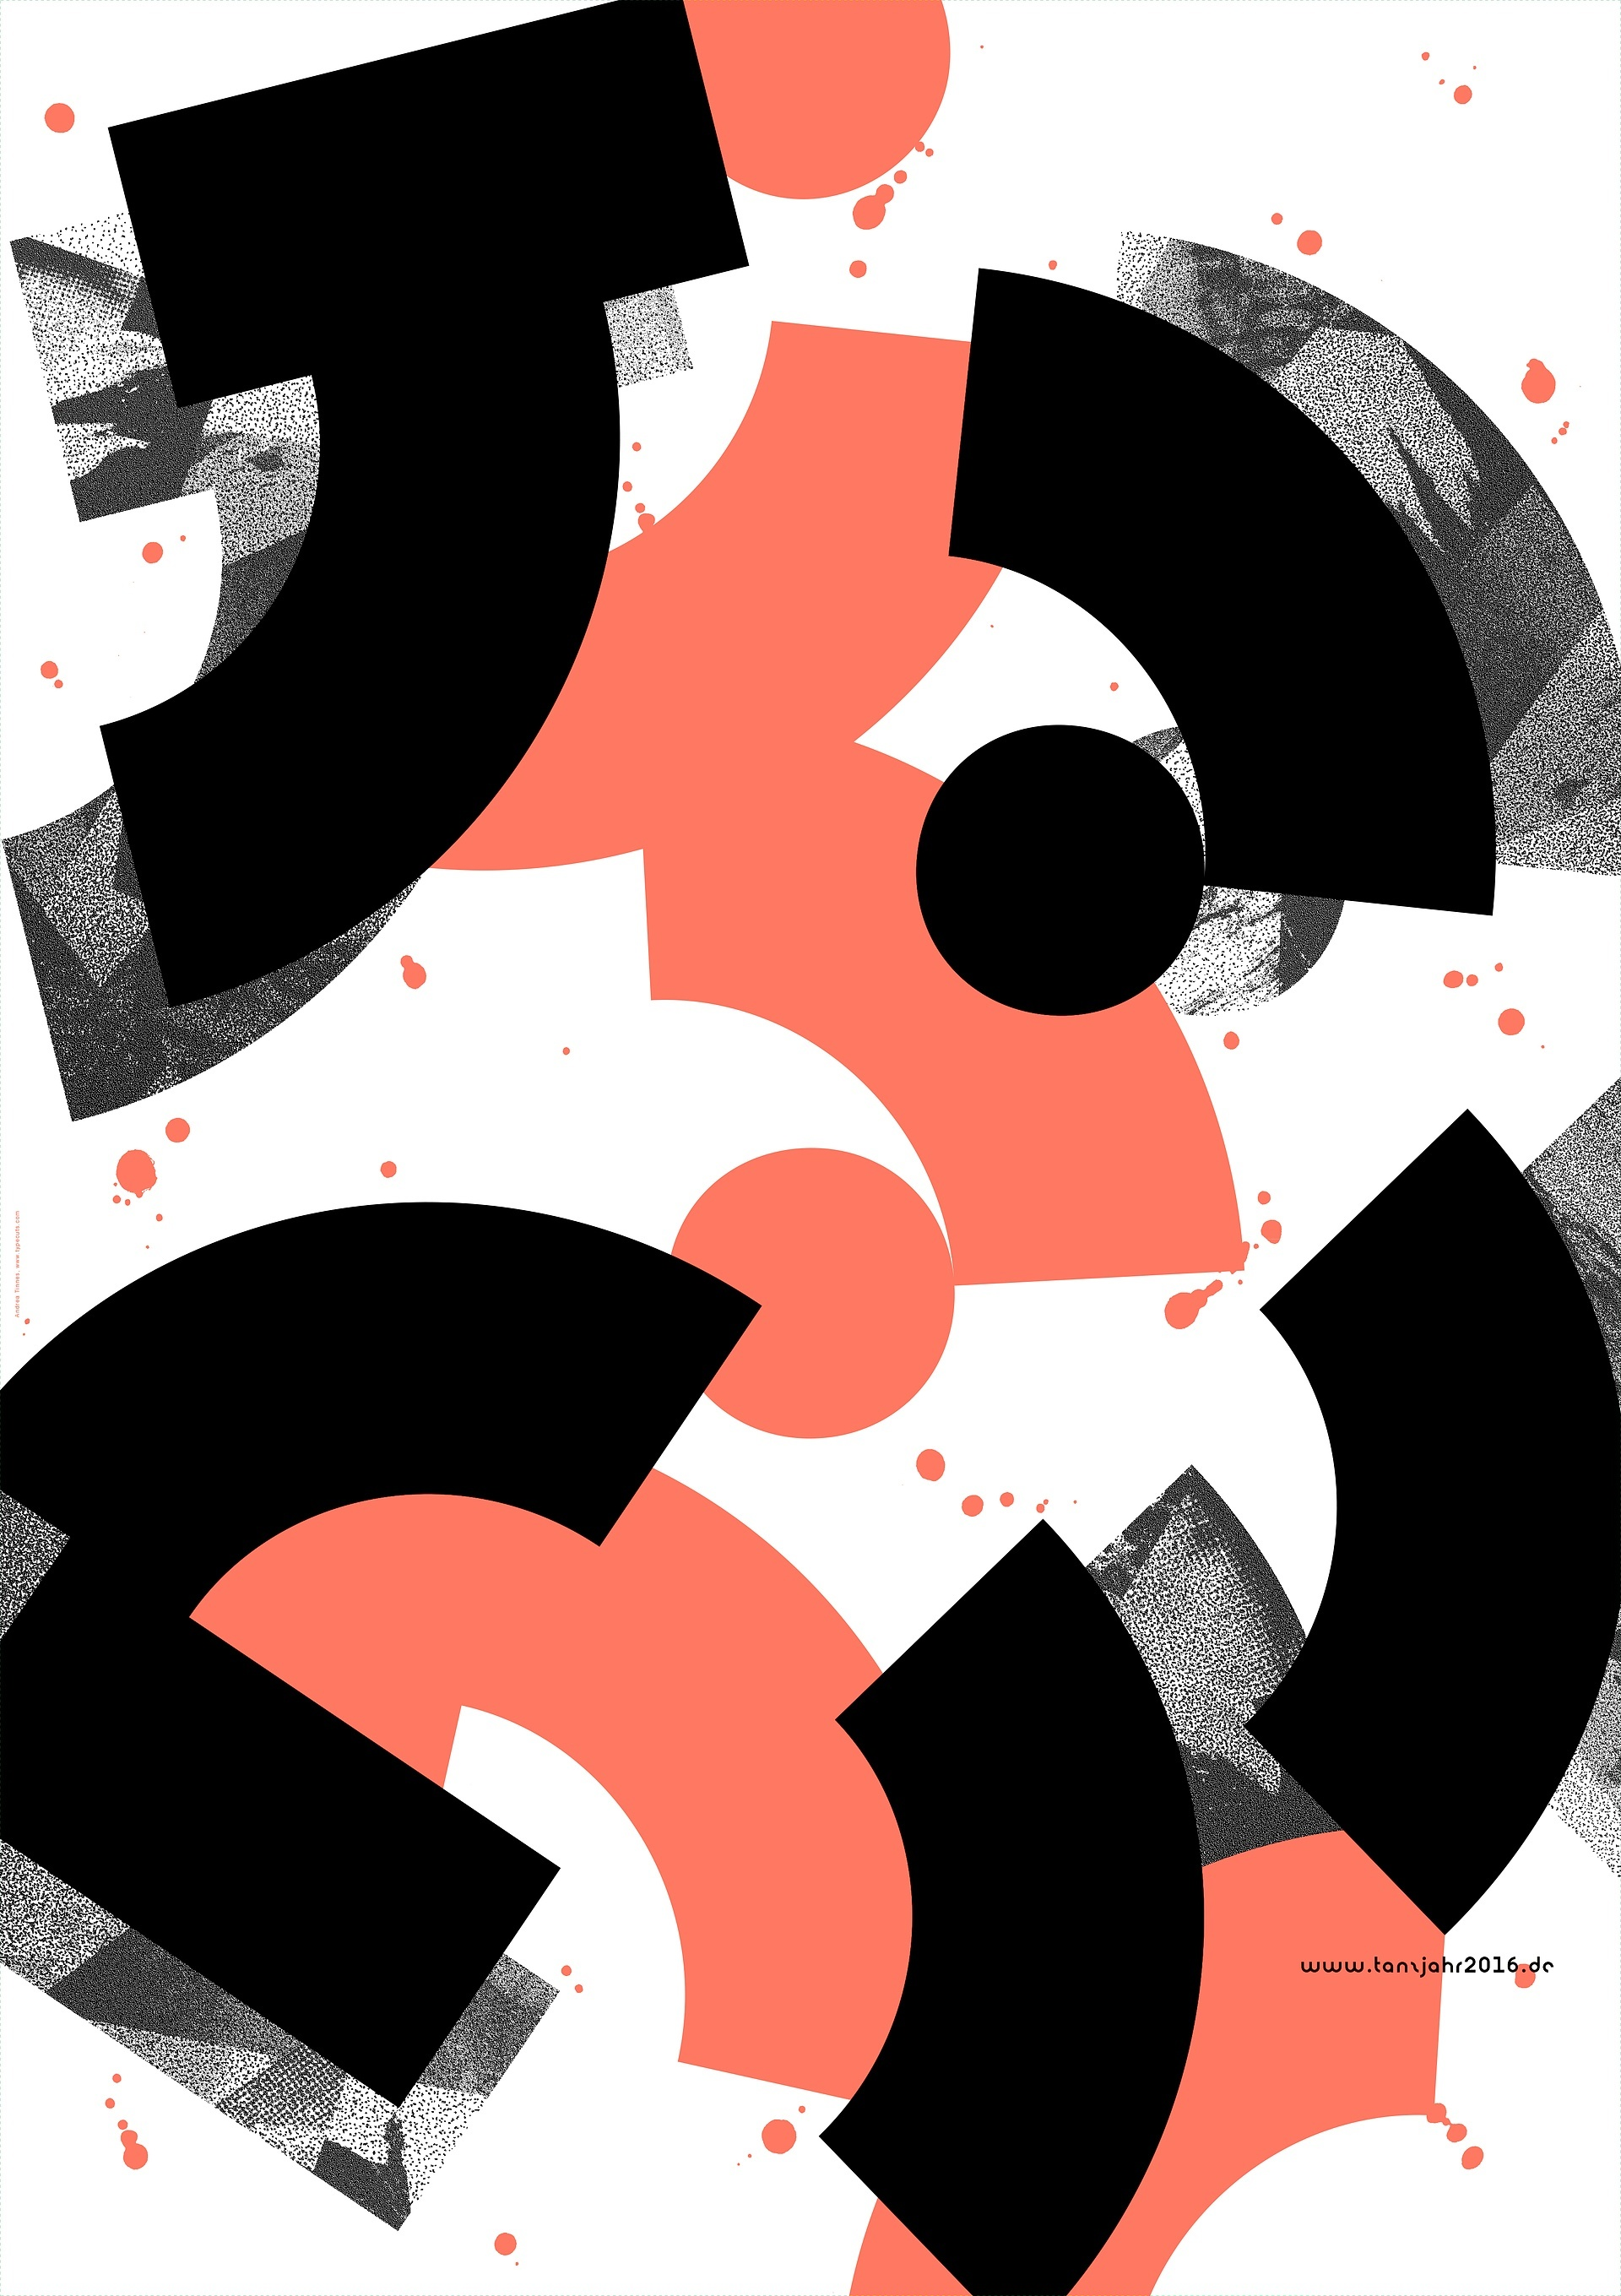 16 designer 3 formen 2 farben 16 plakate f r das tanzjahr 2016. Black Bedroom Furniture Sets. Home Design Ideas